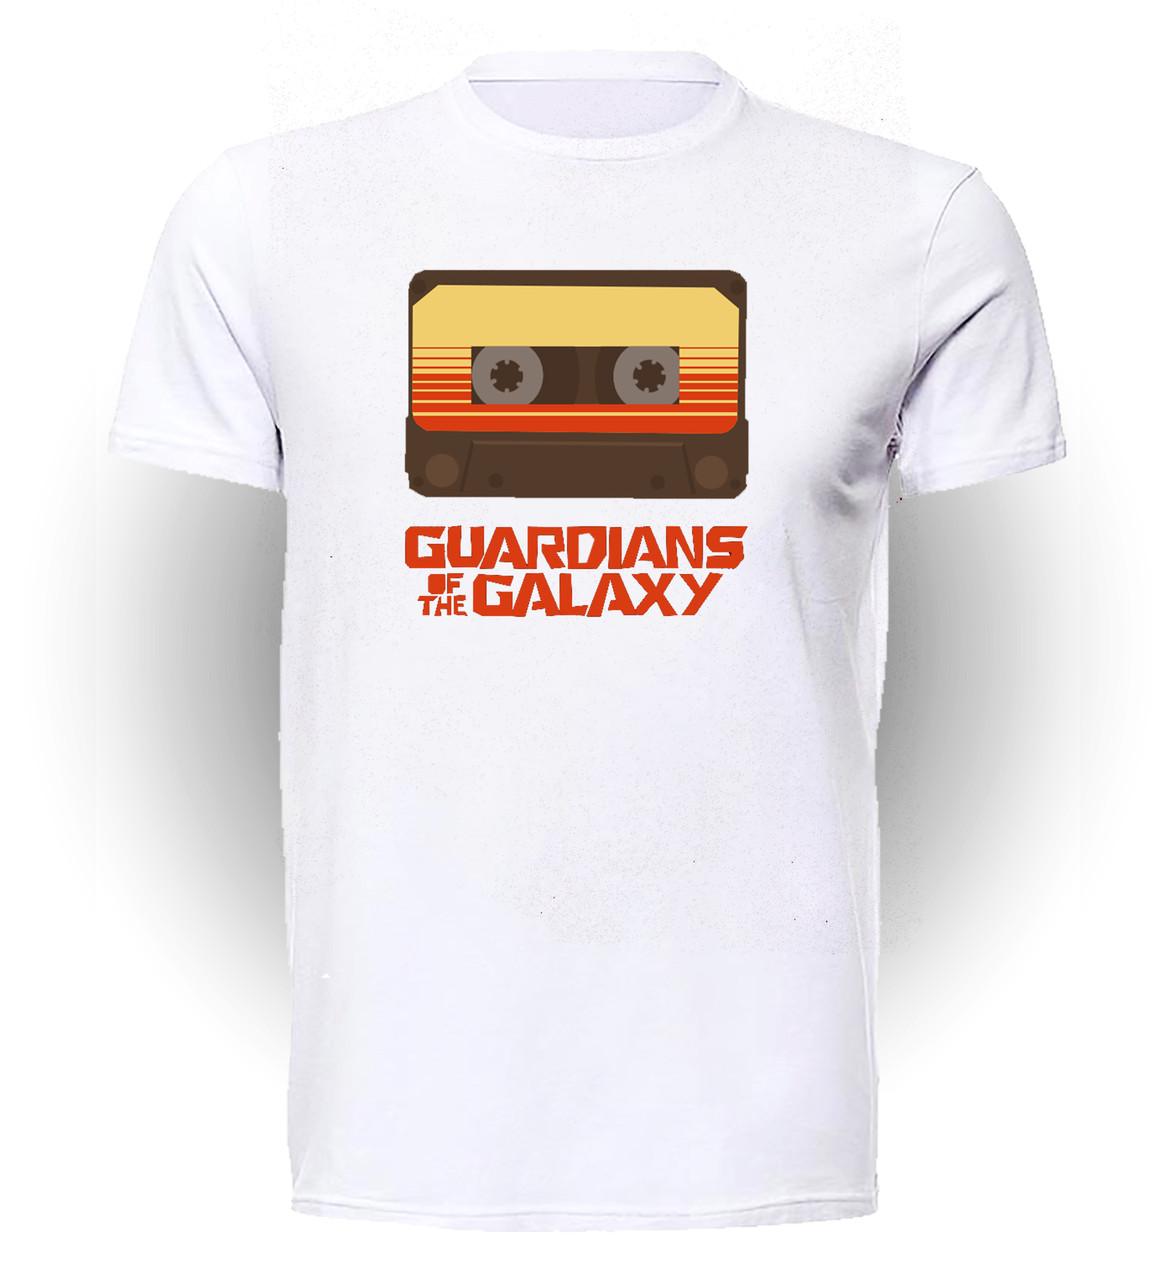 Футболка GeekLand Стражи Галактики Guardians of the Galaxy кассета 2 GG.01.023